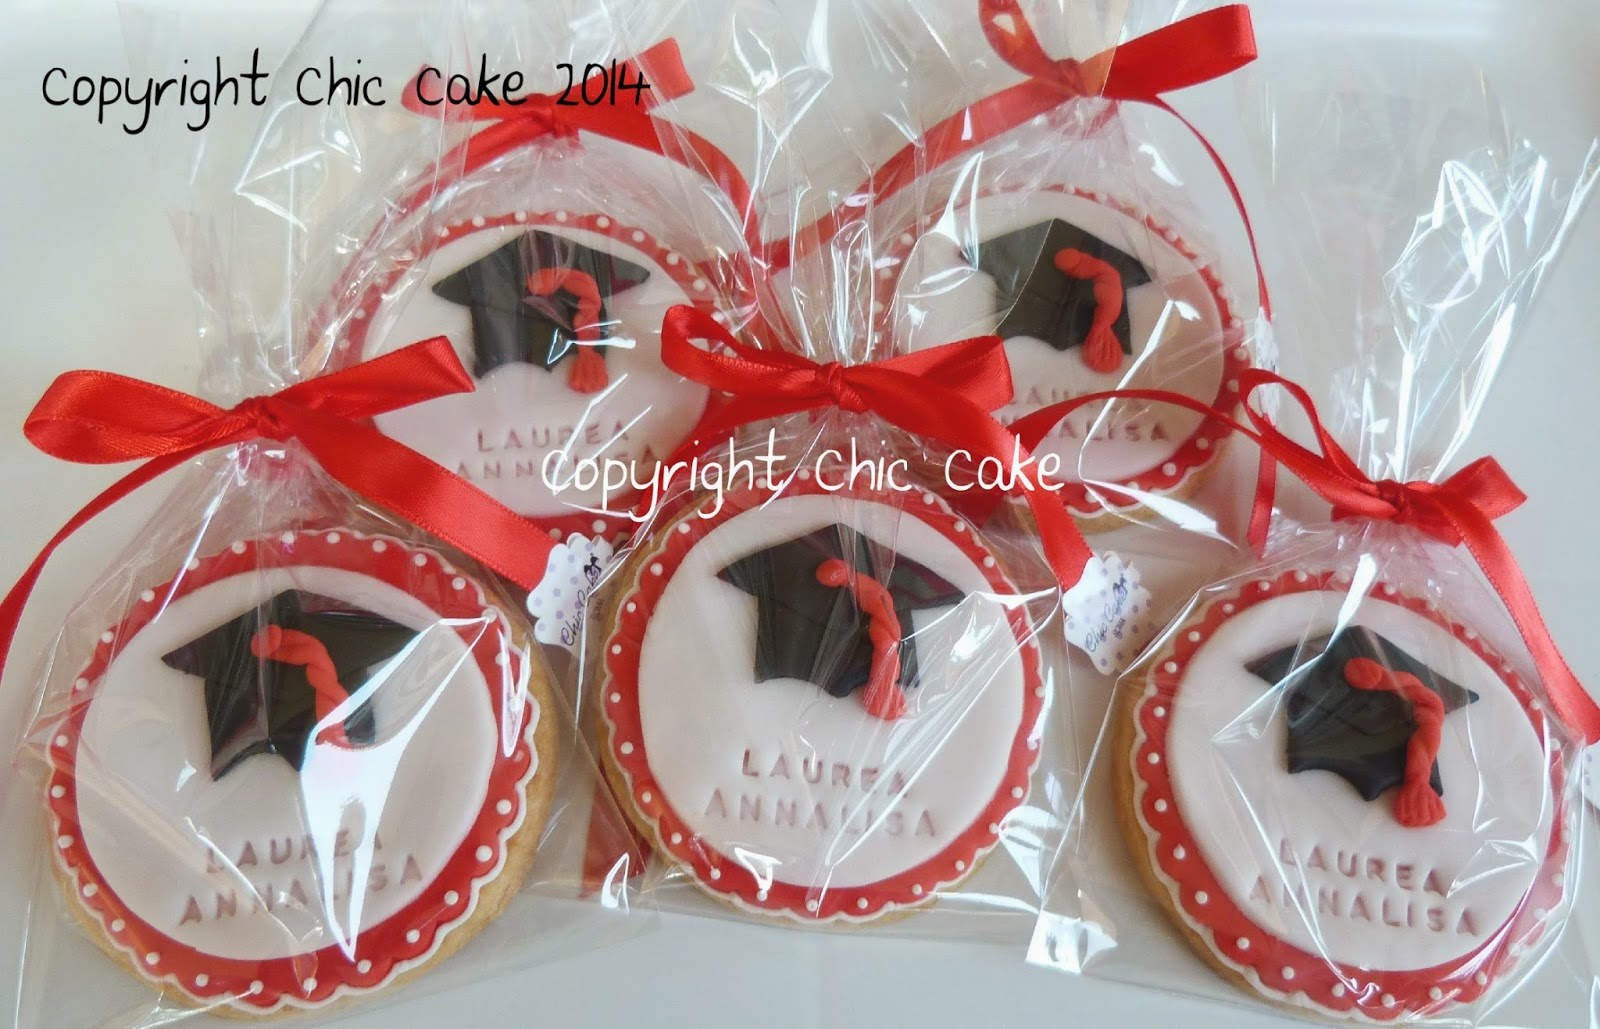 Conosciuto Chic Cake: Biscotti Laurea- Graduation cookies MI42